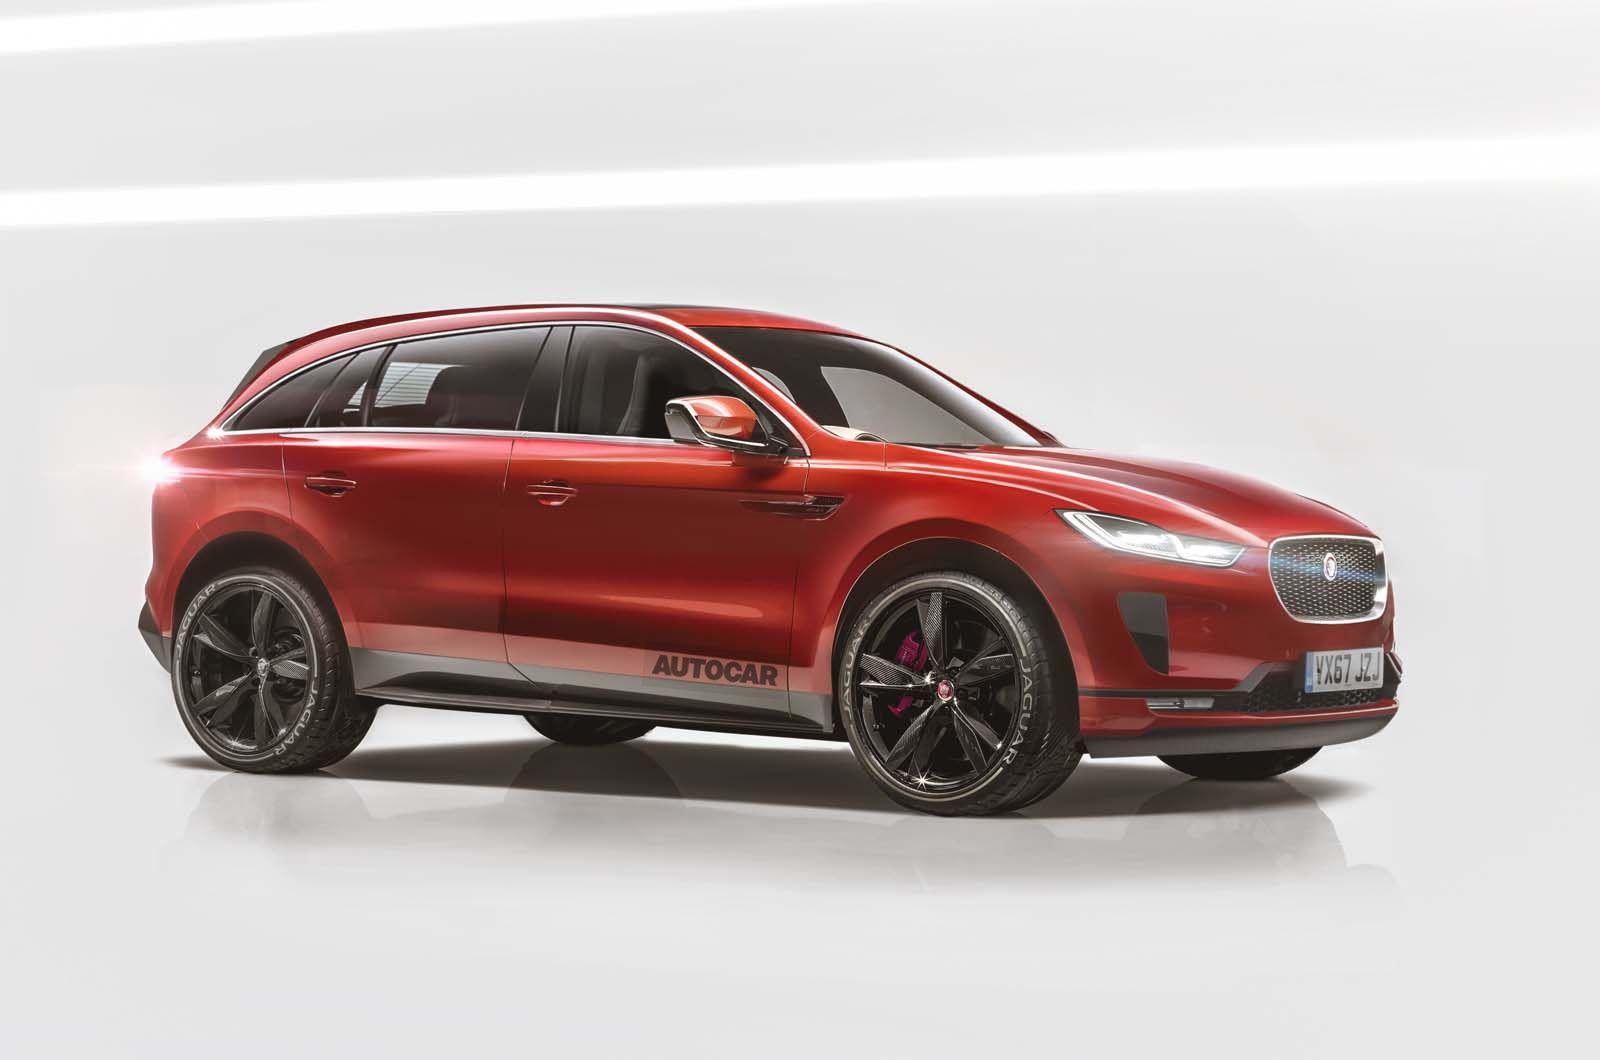 2021 Jaguar I Pace Electric Configurations In 2020 Jaguar Suv Suv Prices New Jaguar Car